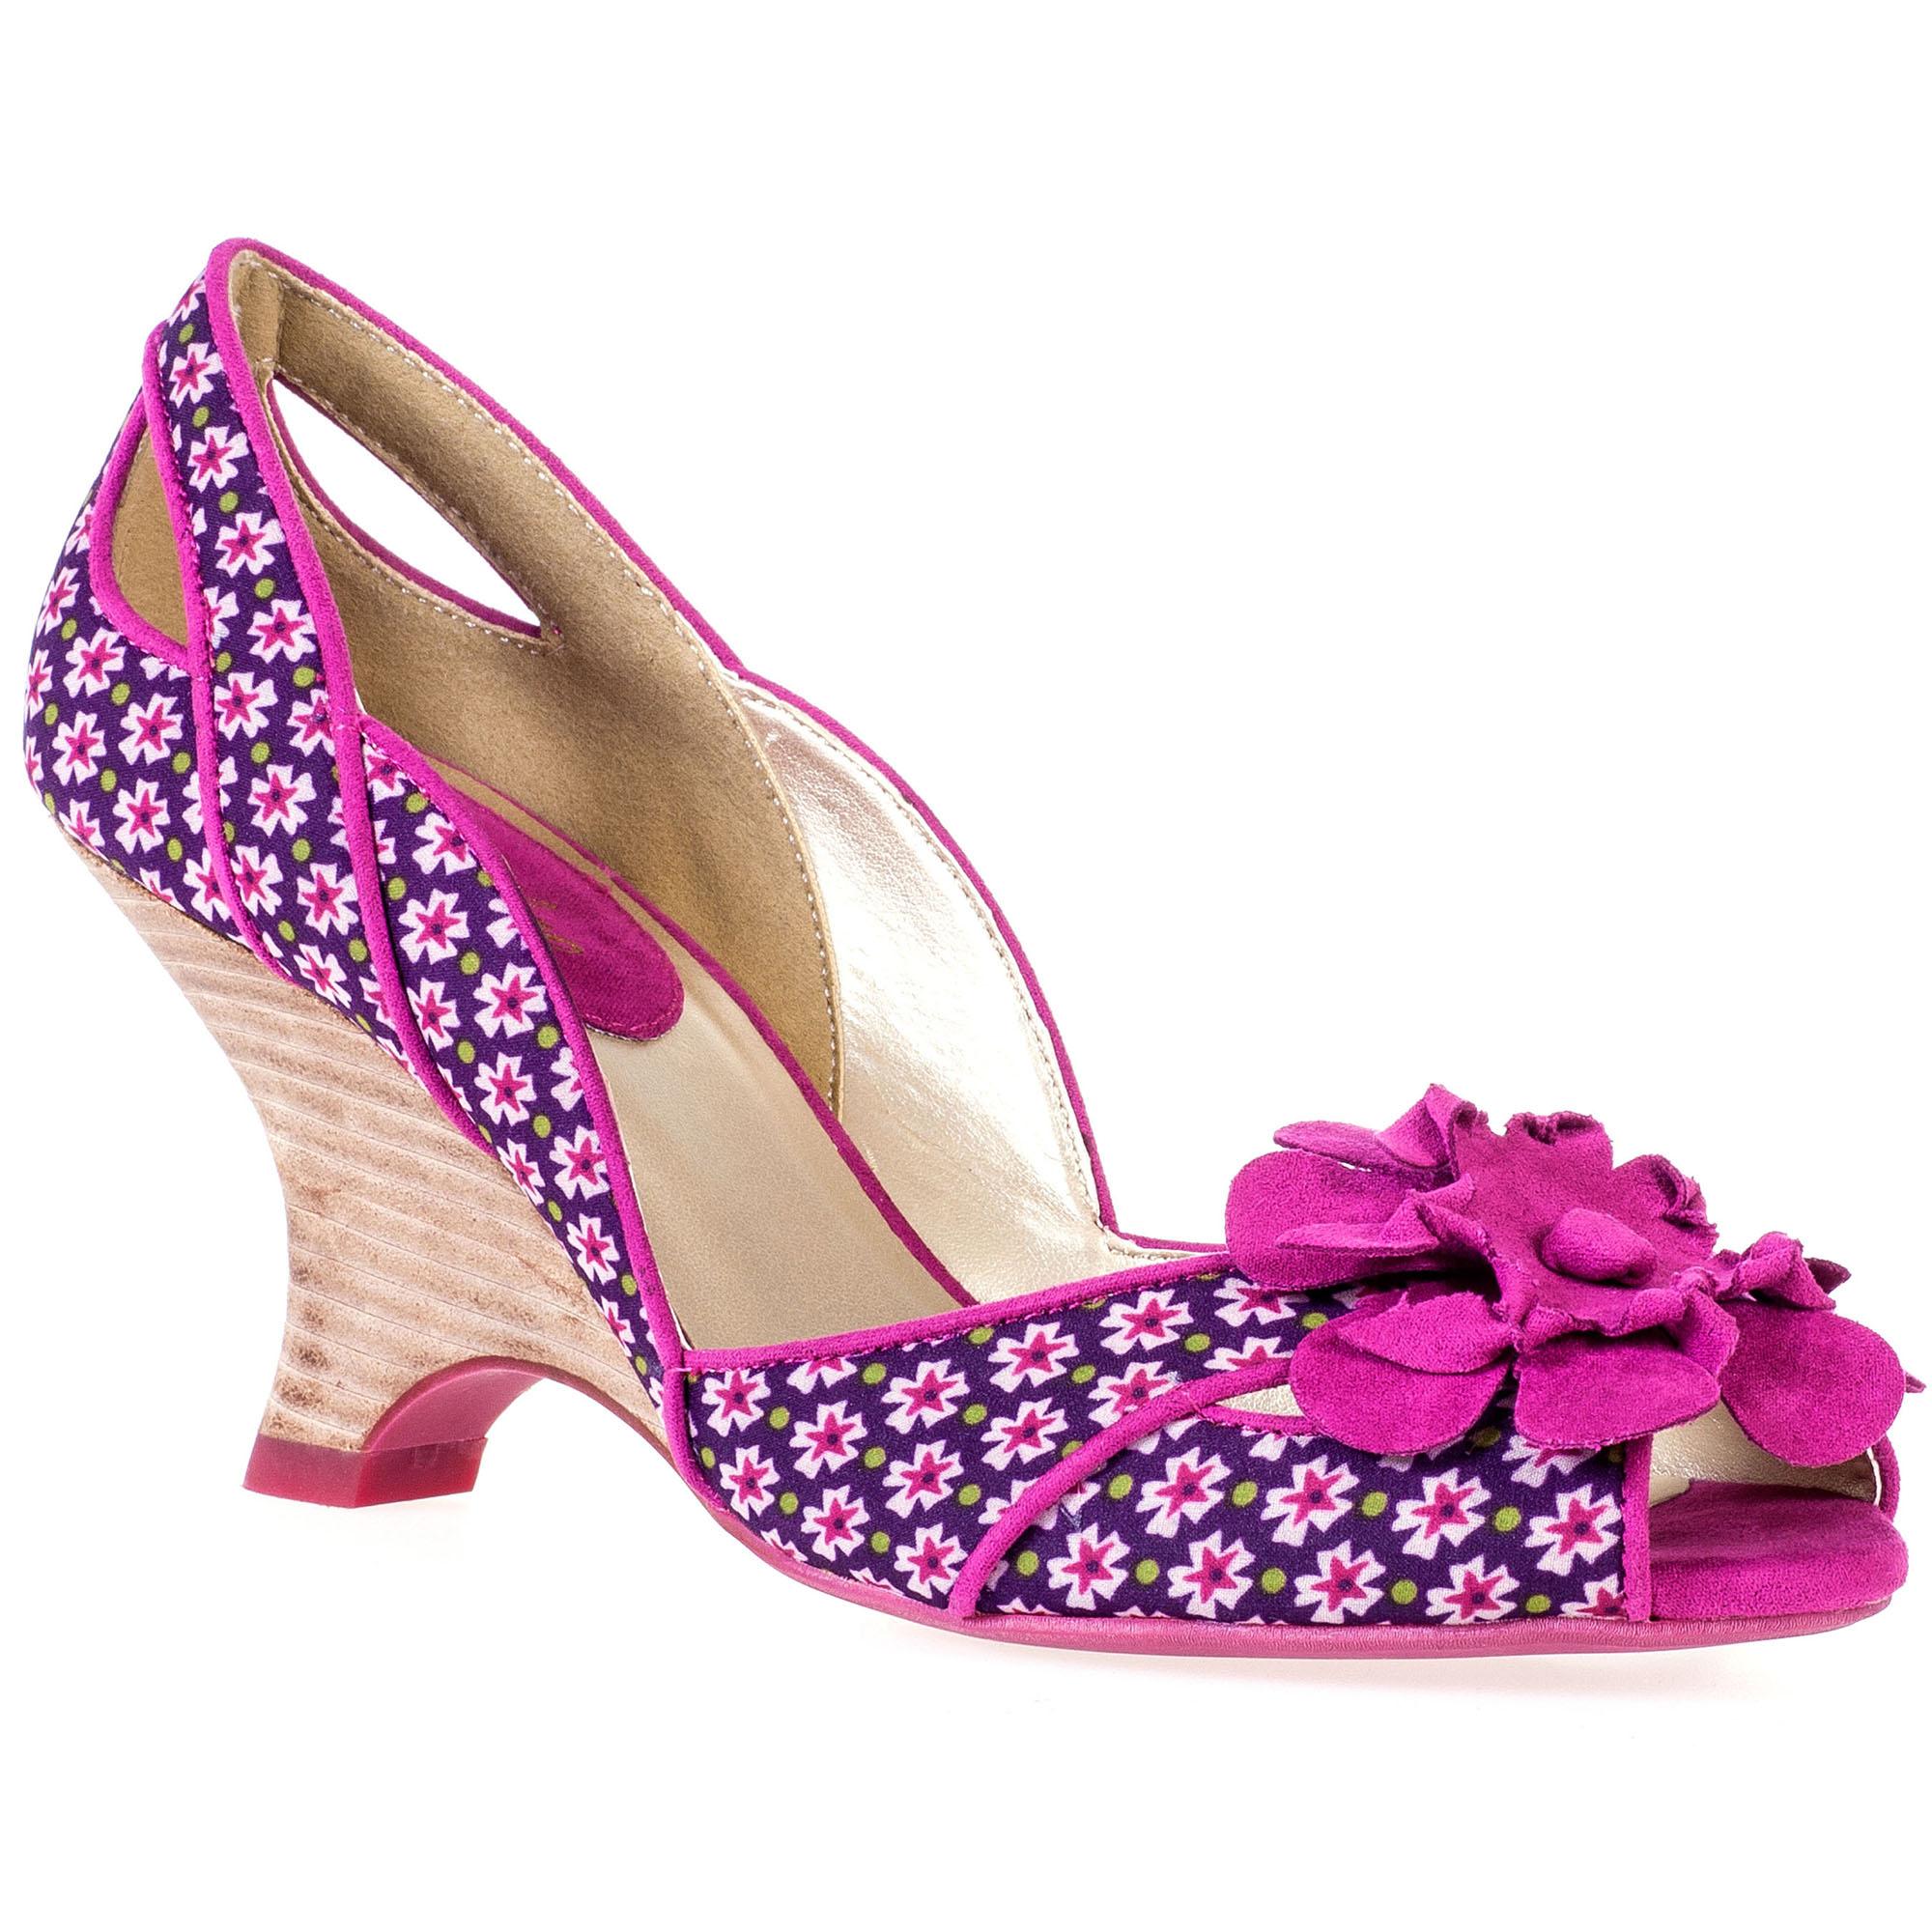 d7d34069 Ruby Shoo Holly Shoes Sz 3 - 8 Purple Vintage Floral Peeptoe Wedge 1940s 4  5 6 7